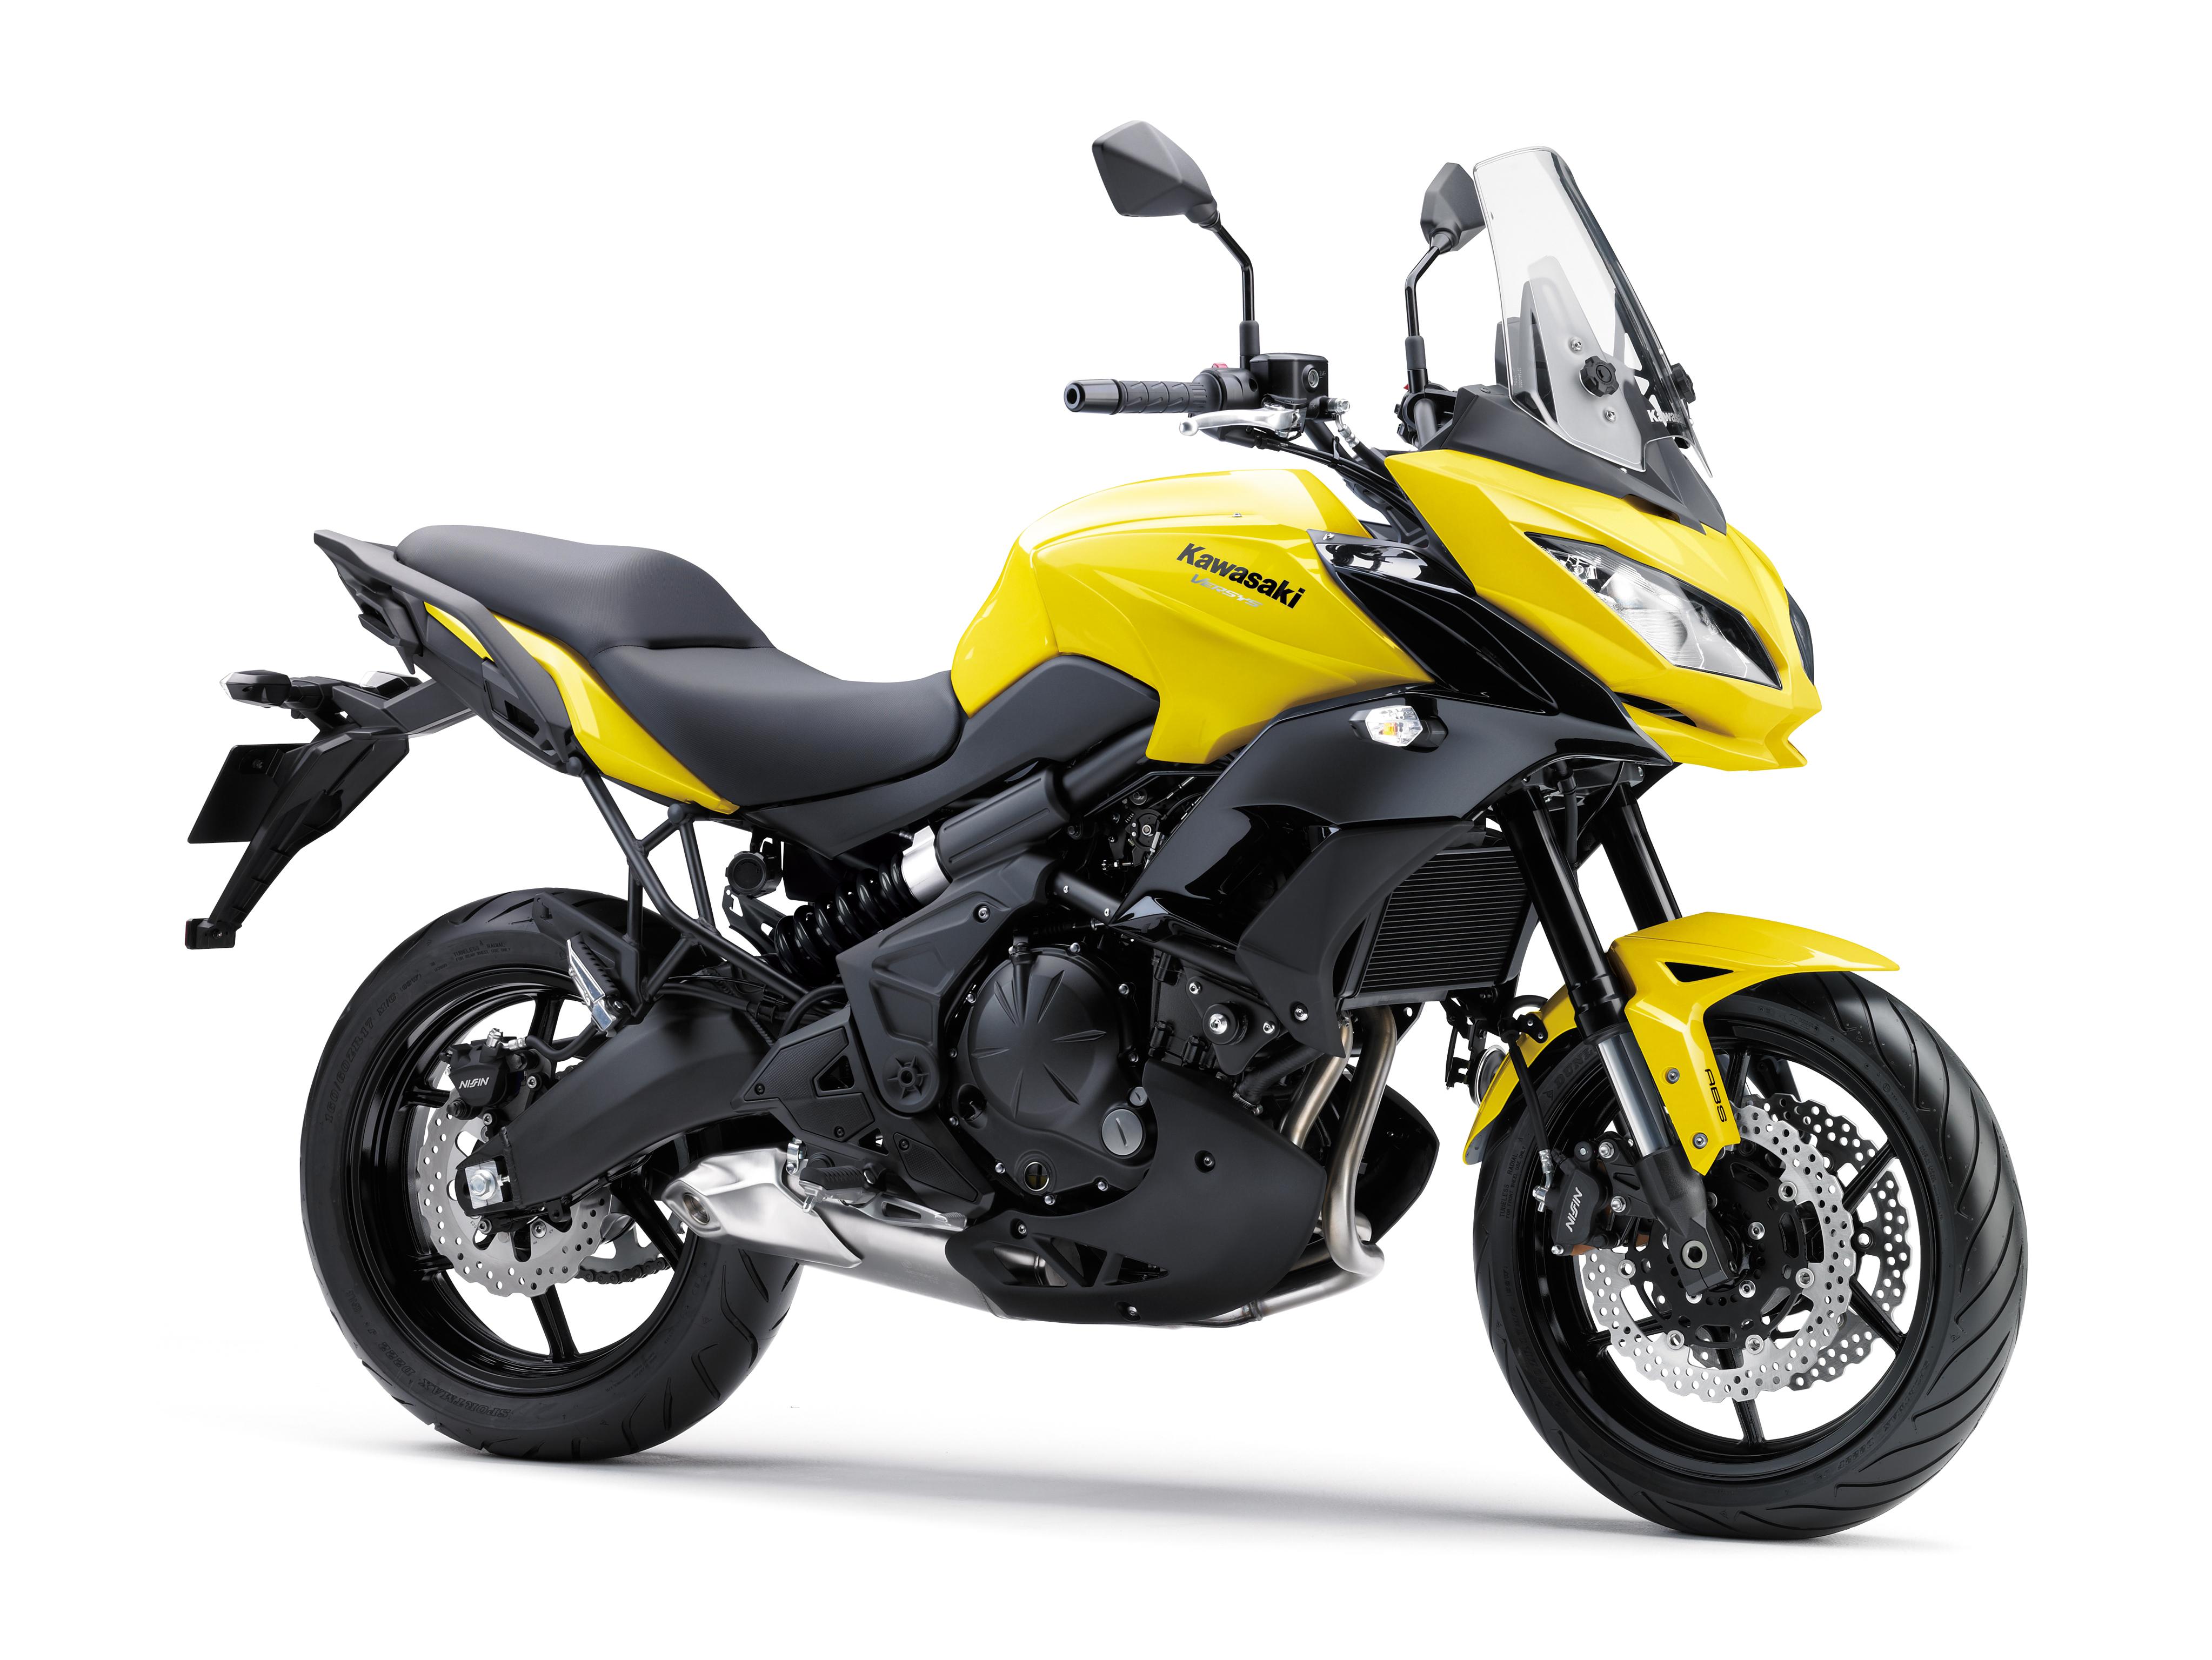 Intermot 2014: New Kawasaki Versys 650 unveiled